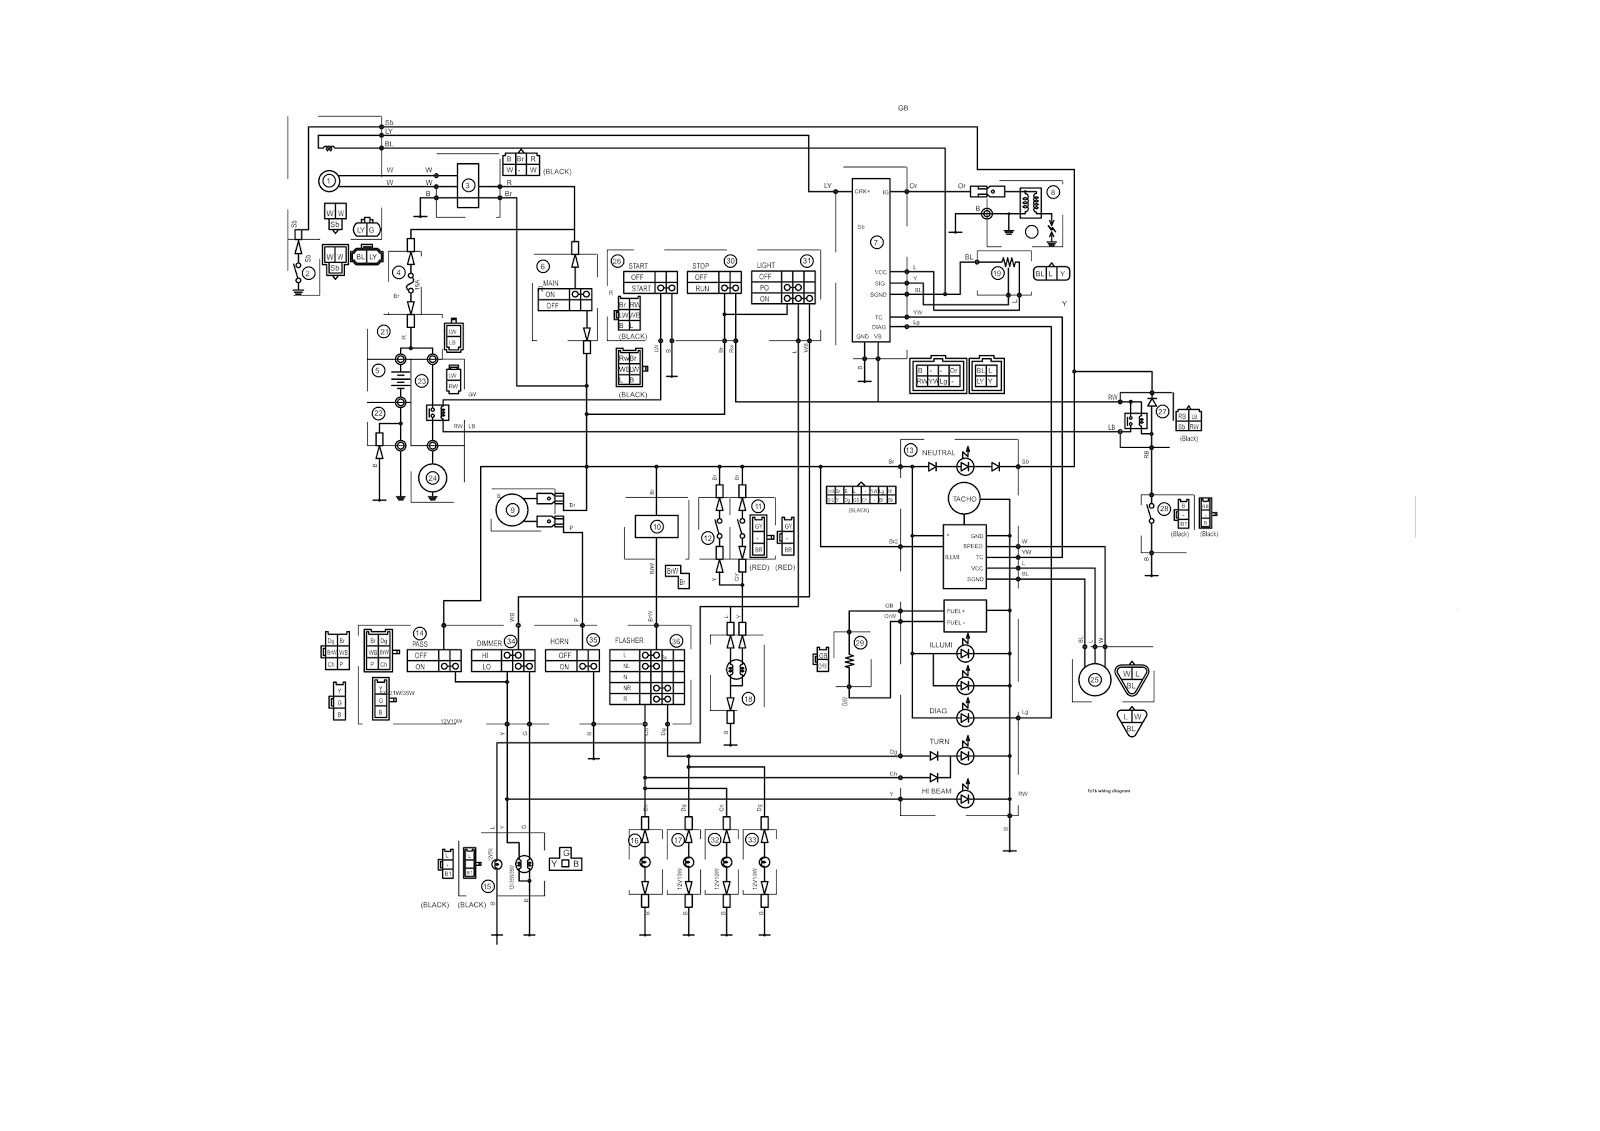 78 chevy truck wiring diagram 1995 honda accord 1986 parts catalog html imageresizertool com